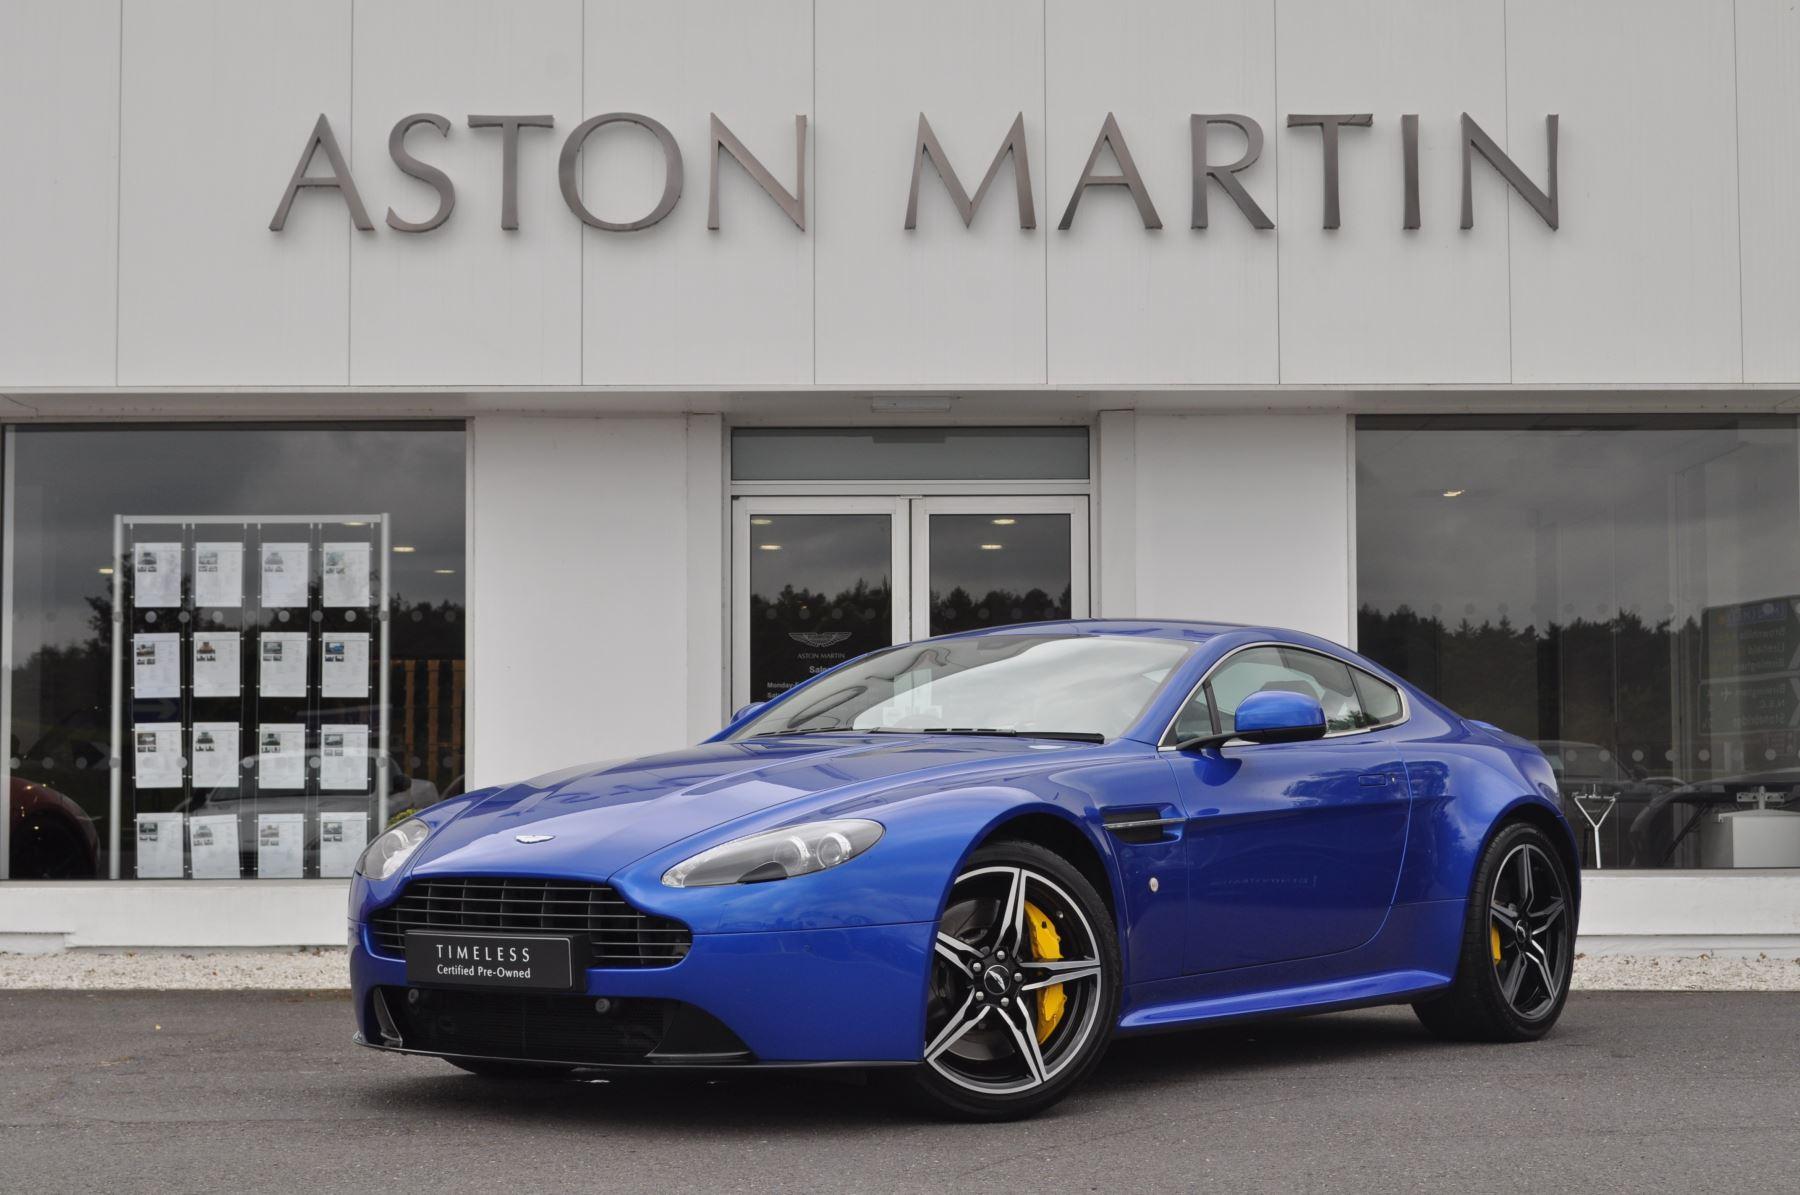 Aston Martin V8 Vantage S Coupe S 2dr Sportshift image 1